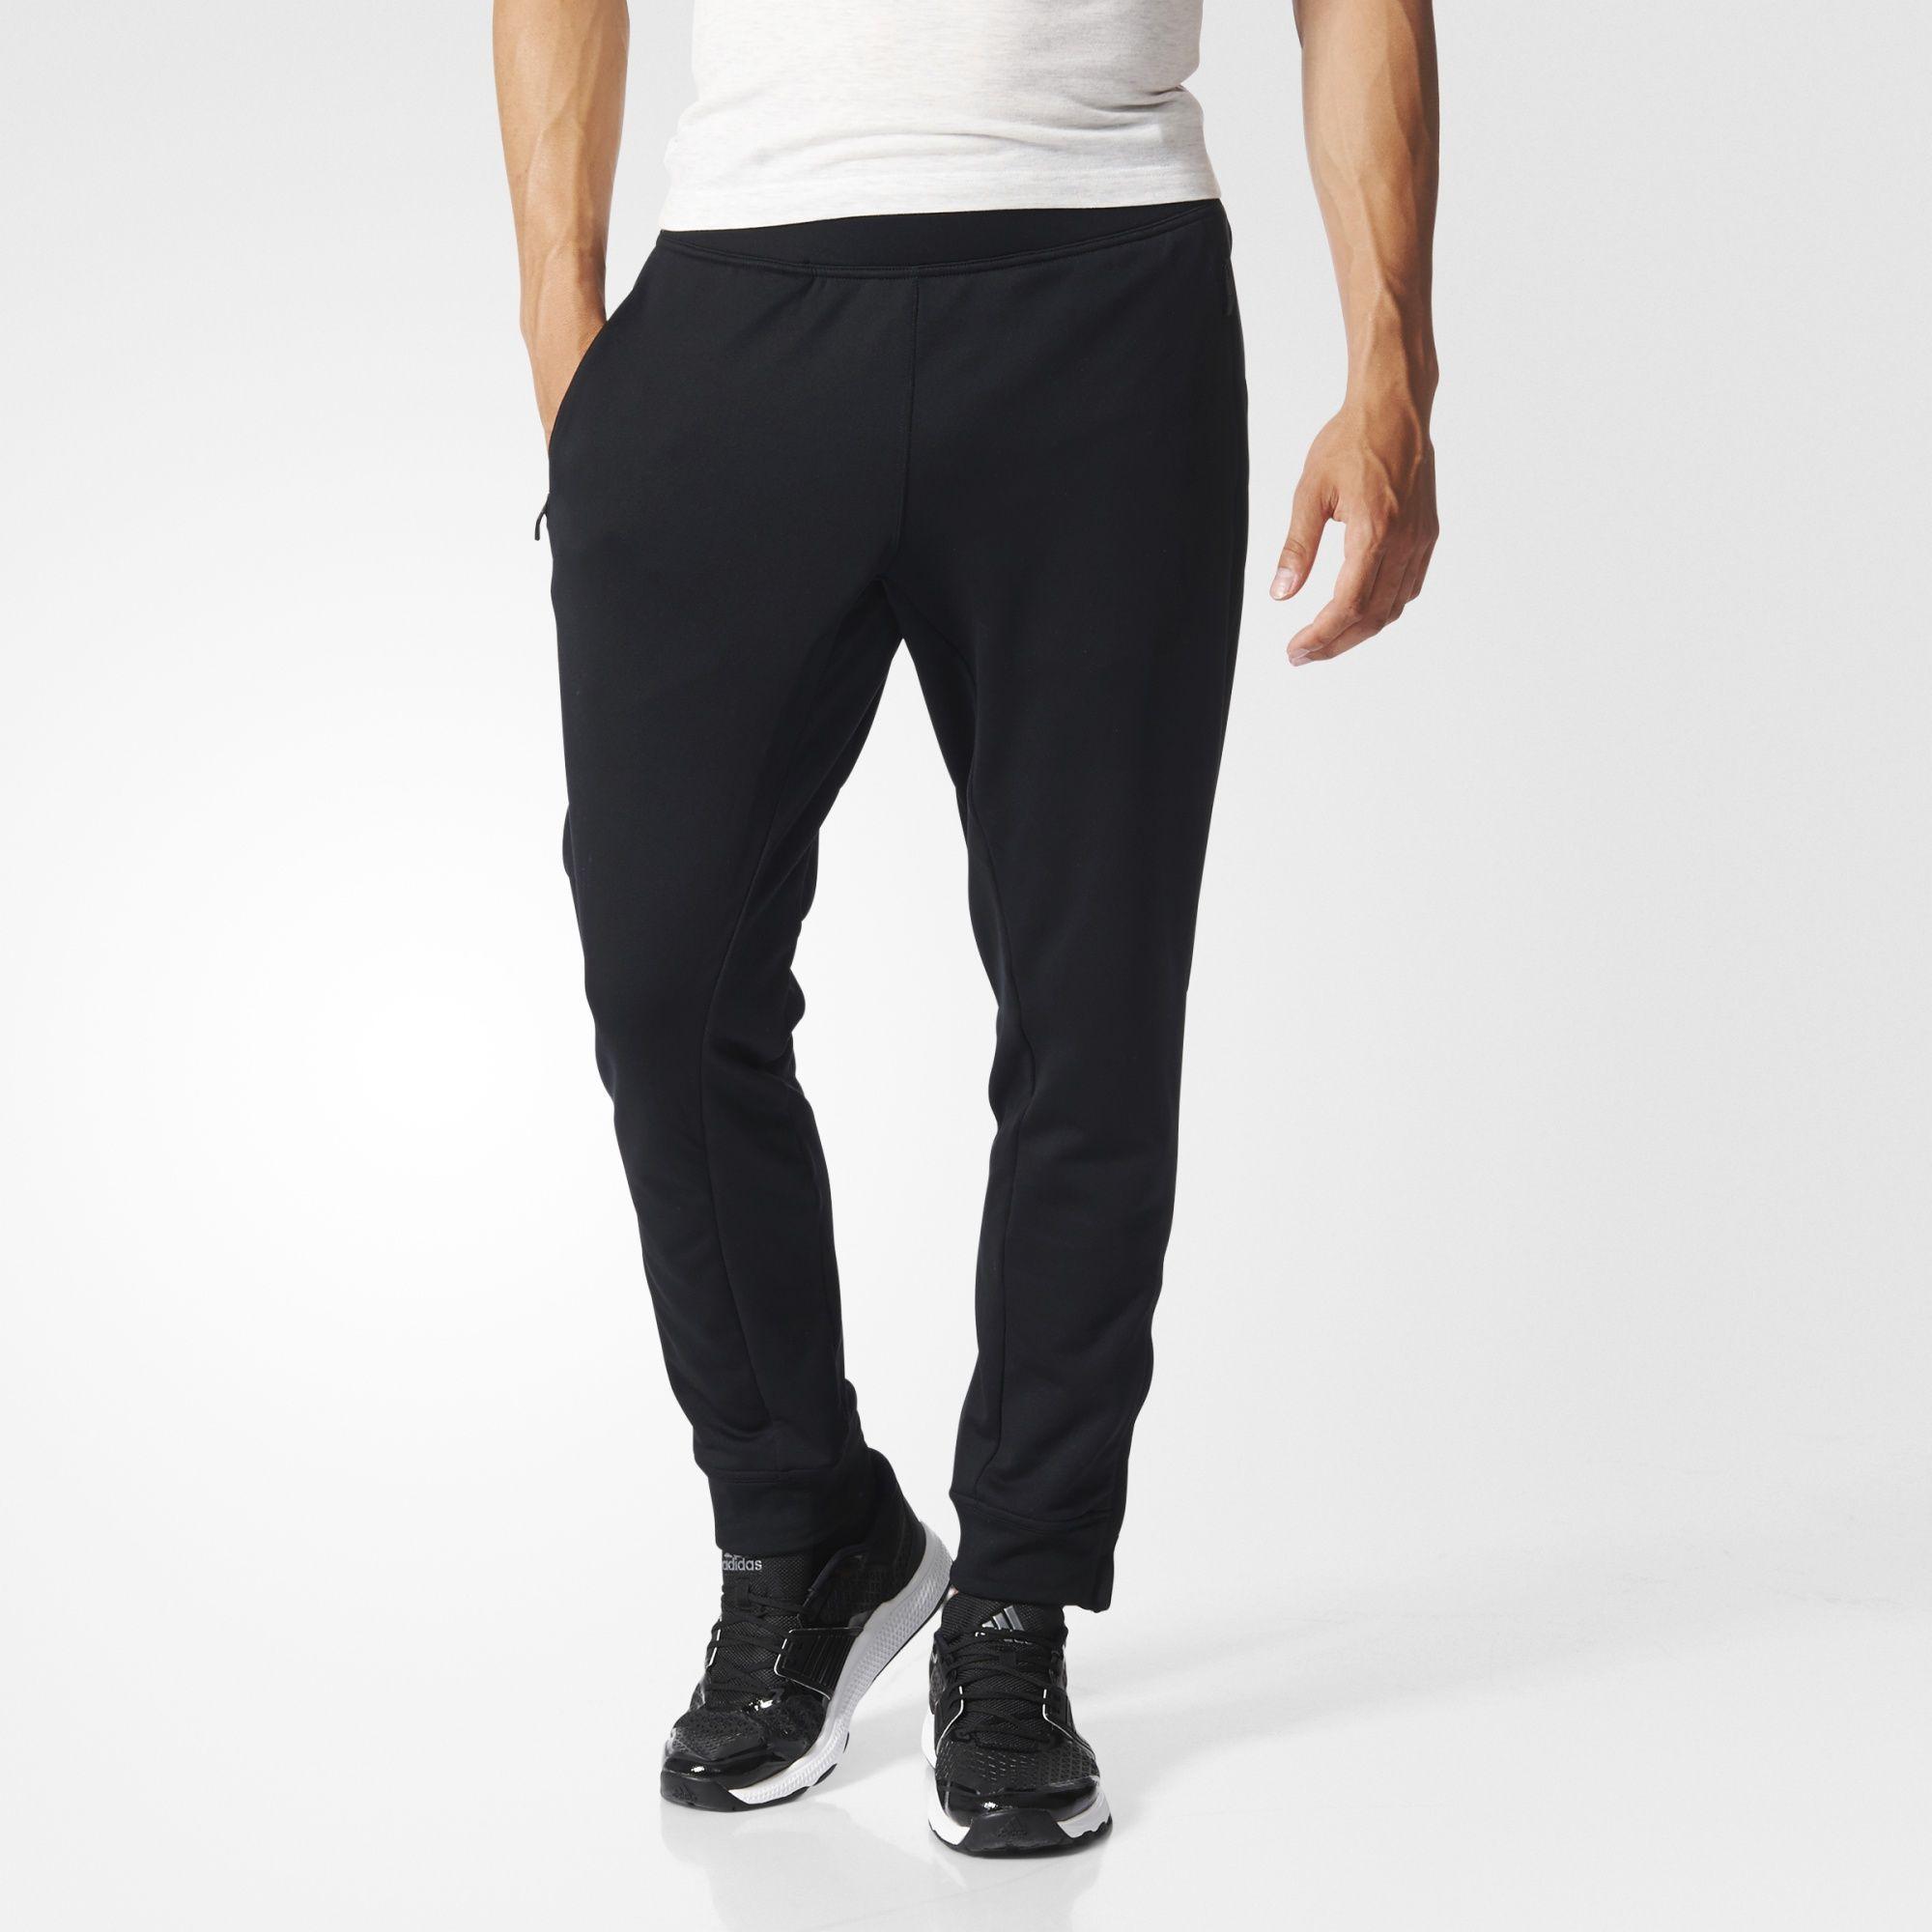 Adidas Climaheat Pants Size Large Pants Athletic Sweatpants Sportswear [ 2000 x 2000 Pixel ]